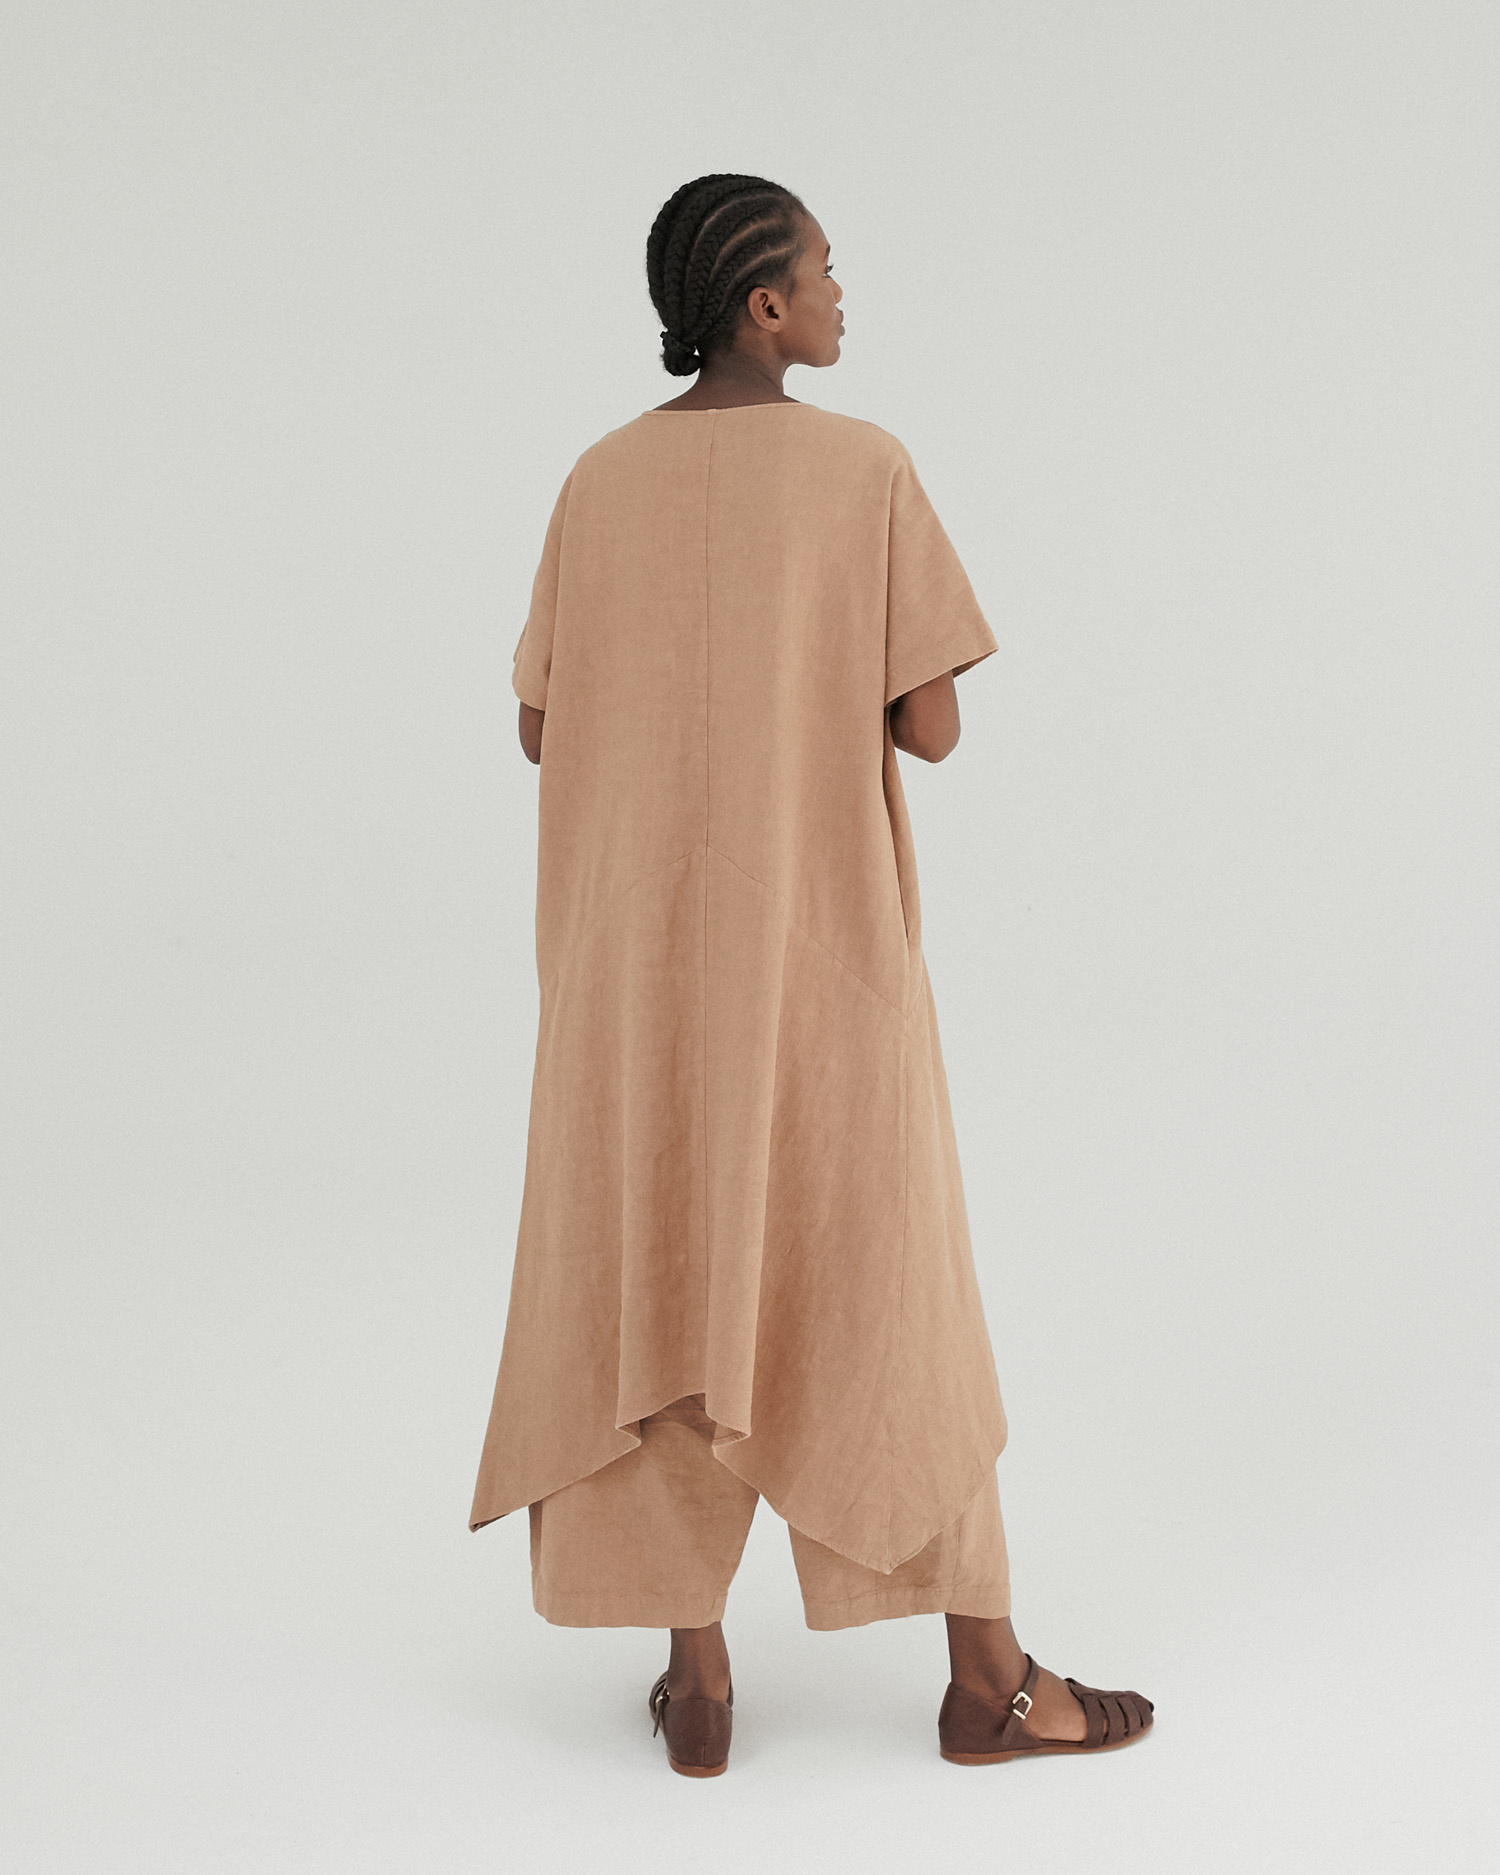 Monica Cordera Clay Pot Asymmetric Ramie Dress ONE SIZE FITS ALL